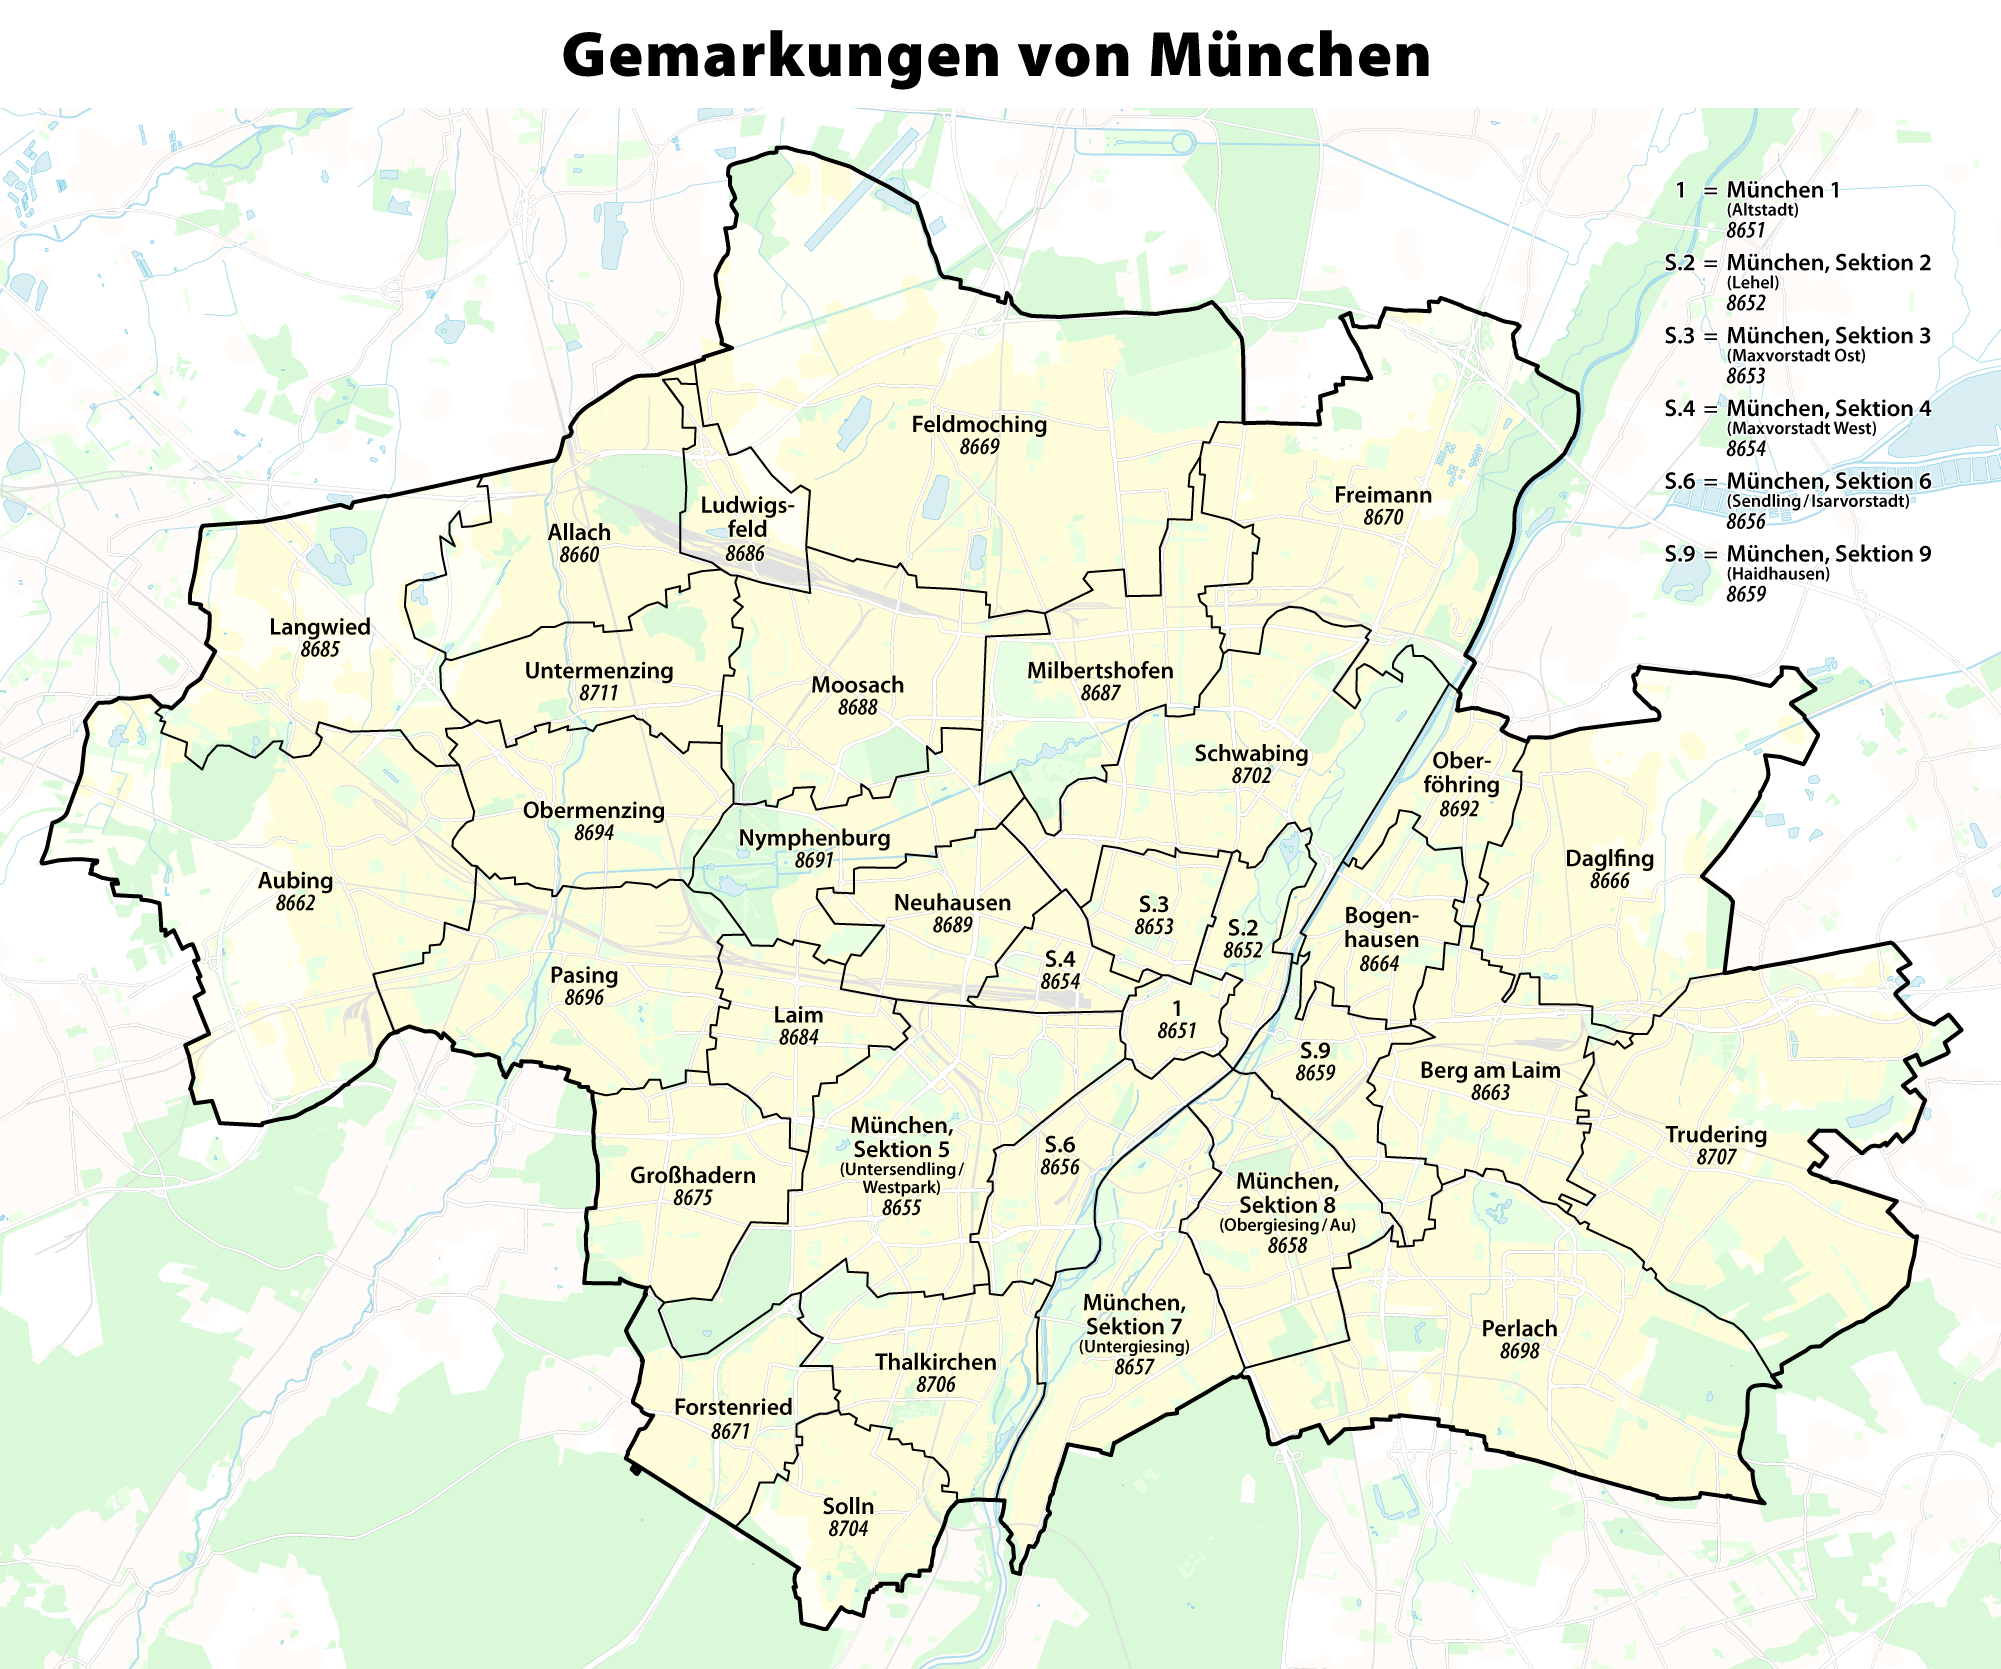 File Karte Der Gemarkungen In Munchen Png Wikimedia Commons